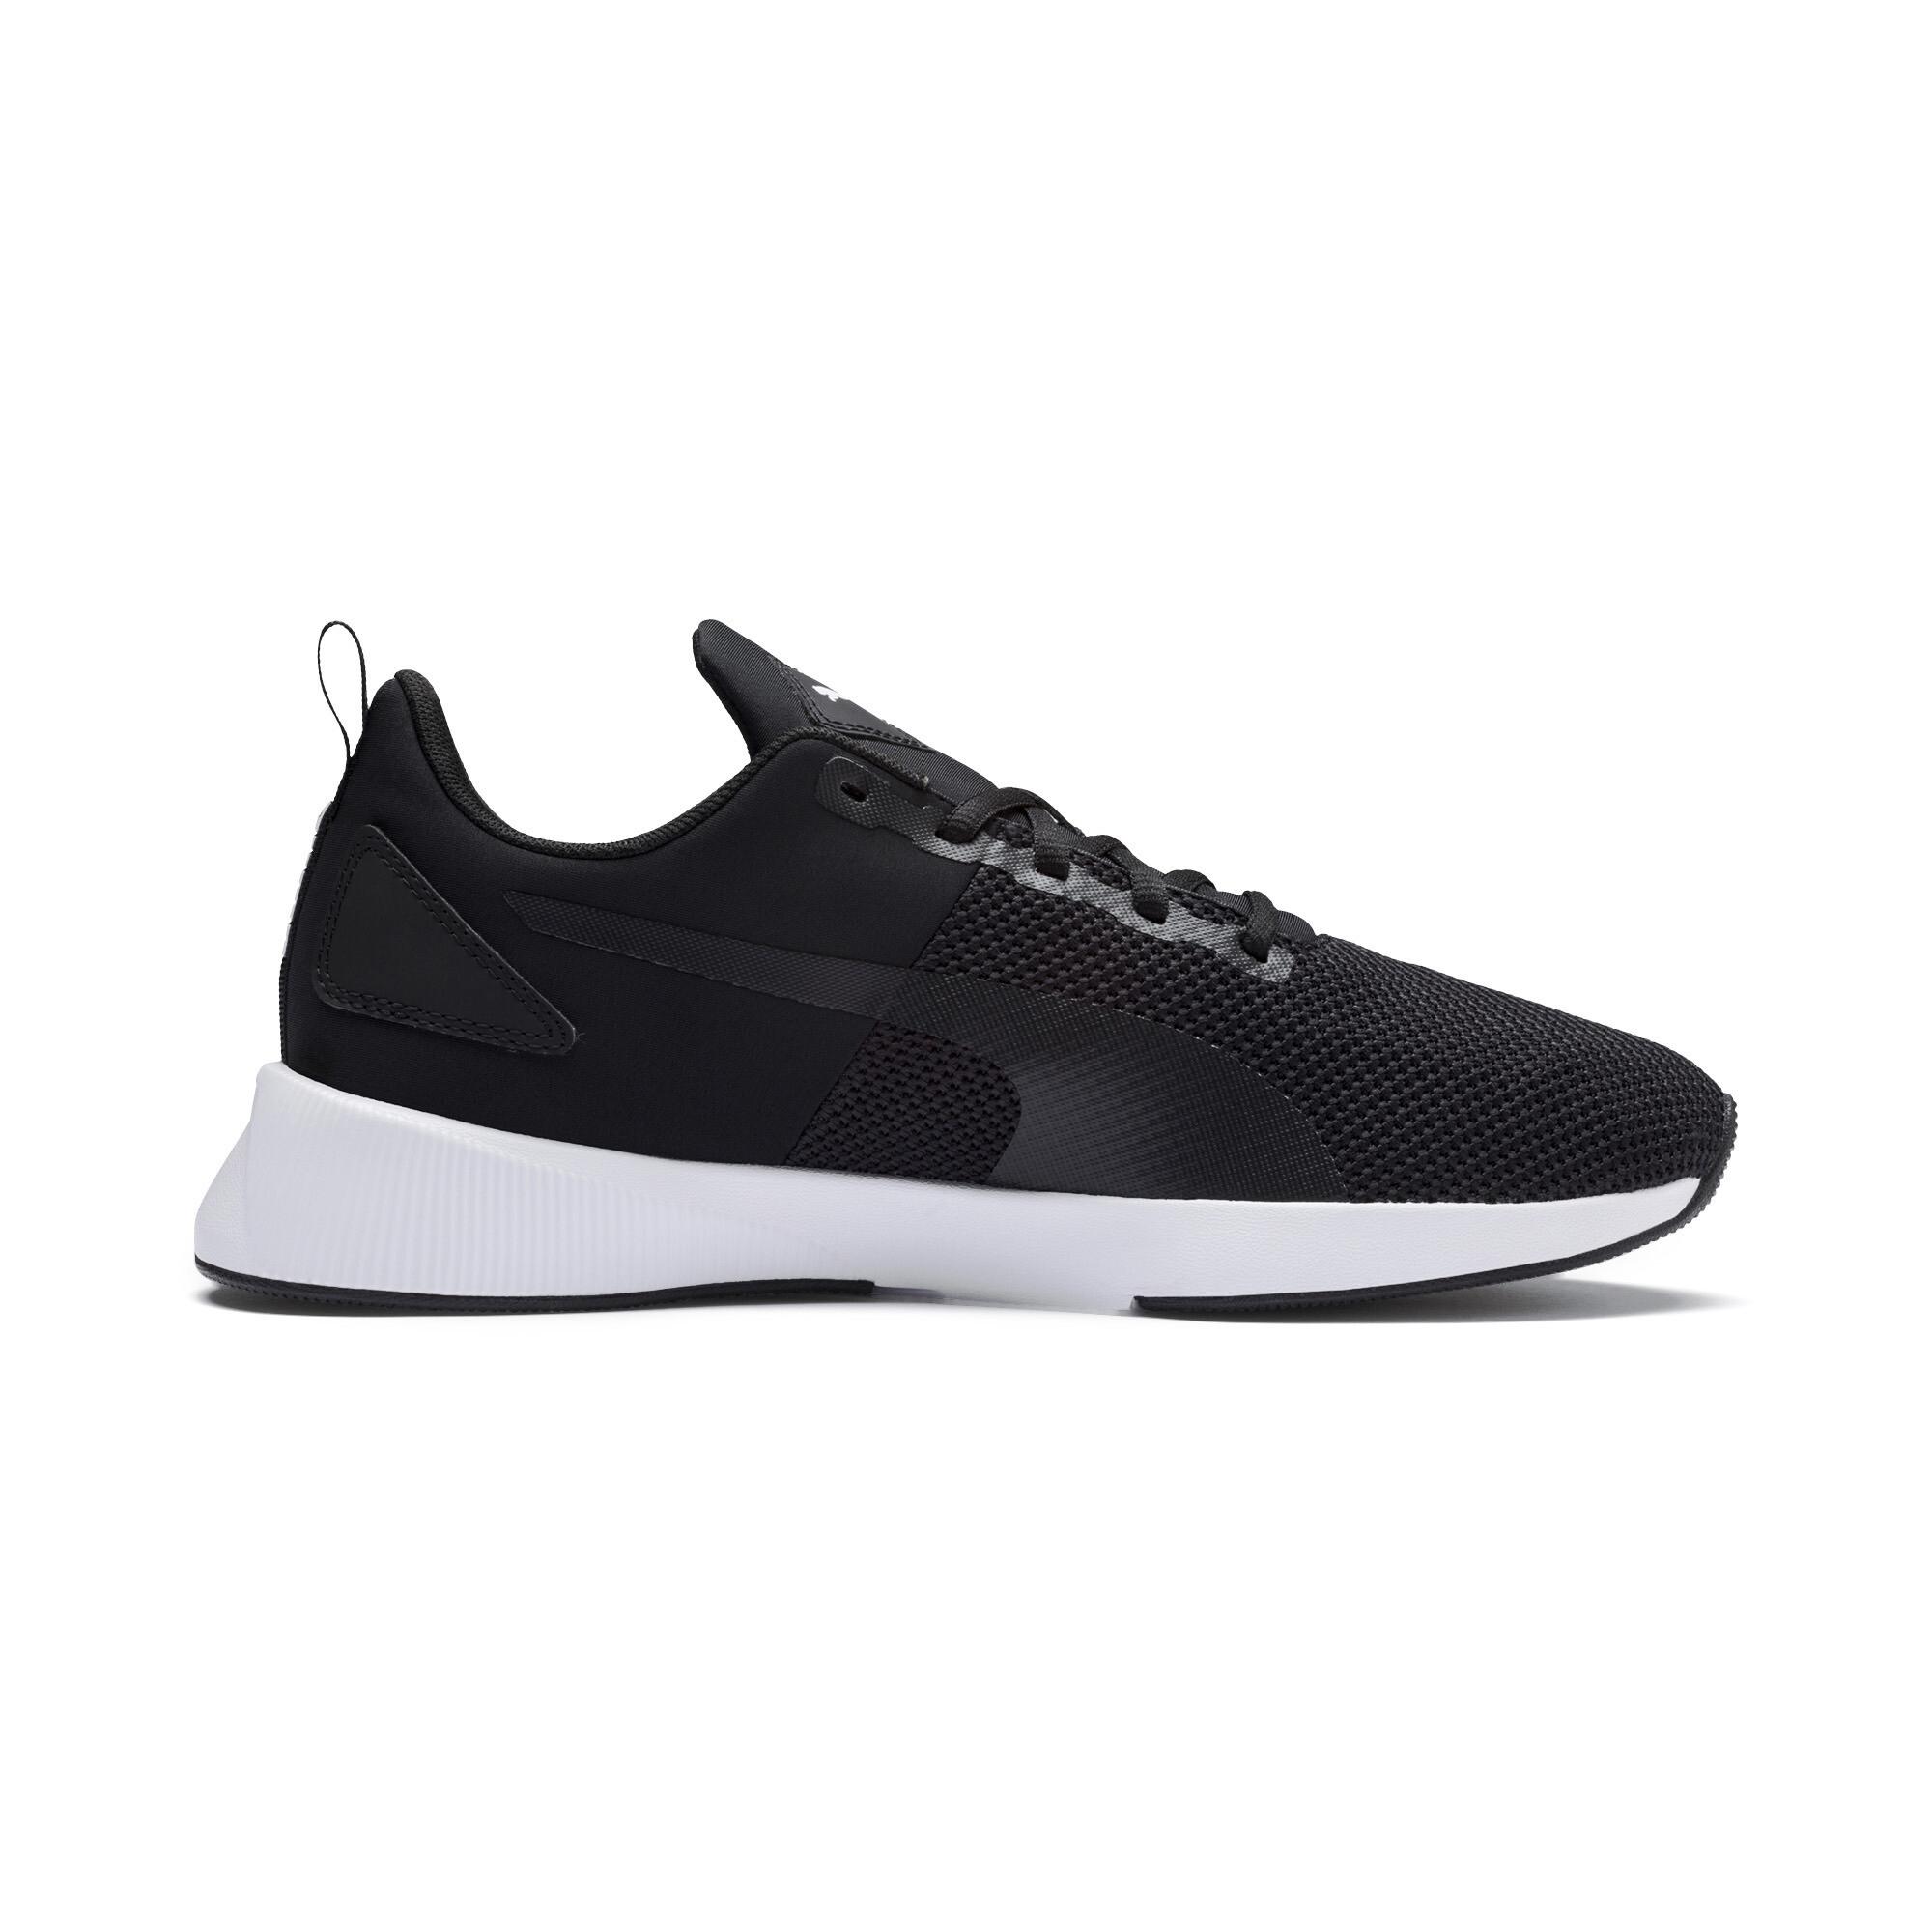 PUMA-Flyer-Runner-Running-Shoes-Mens-Shoe-Running thumbnail 6